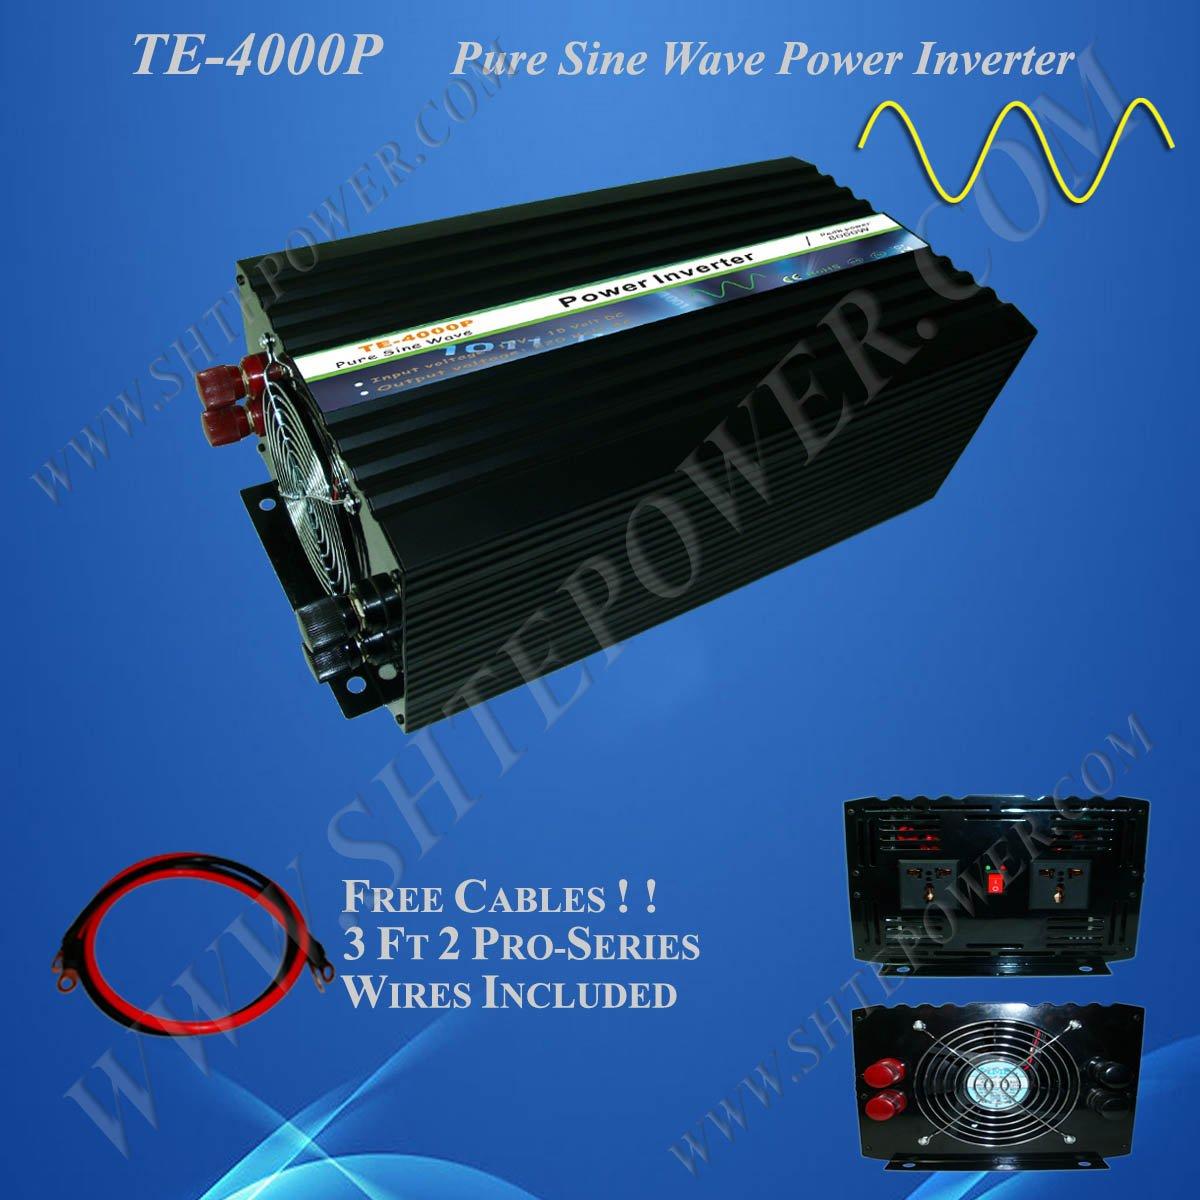 48VDC to 100VAV 4000watts Pure Sine Wave Power Inverter48VDC to 100VAV 4000watts Pure Sine Wave Power Inverter